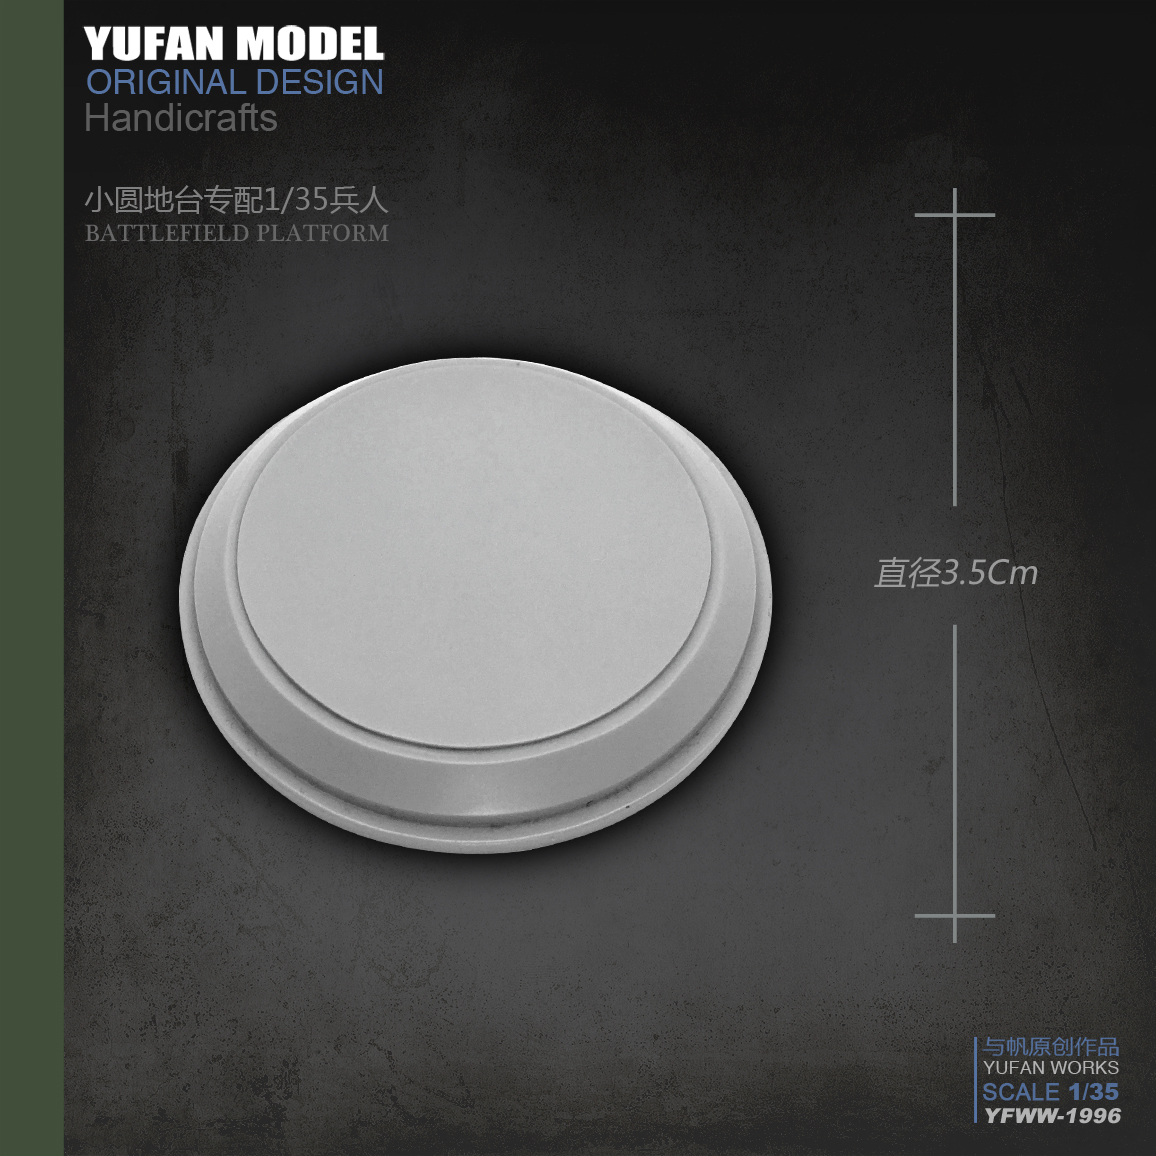 Yufan Model Resin Platform Accessories Created 3.5cm Resin Soldier Platform Model Yfww-1996